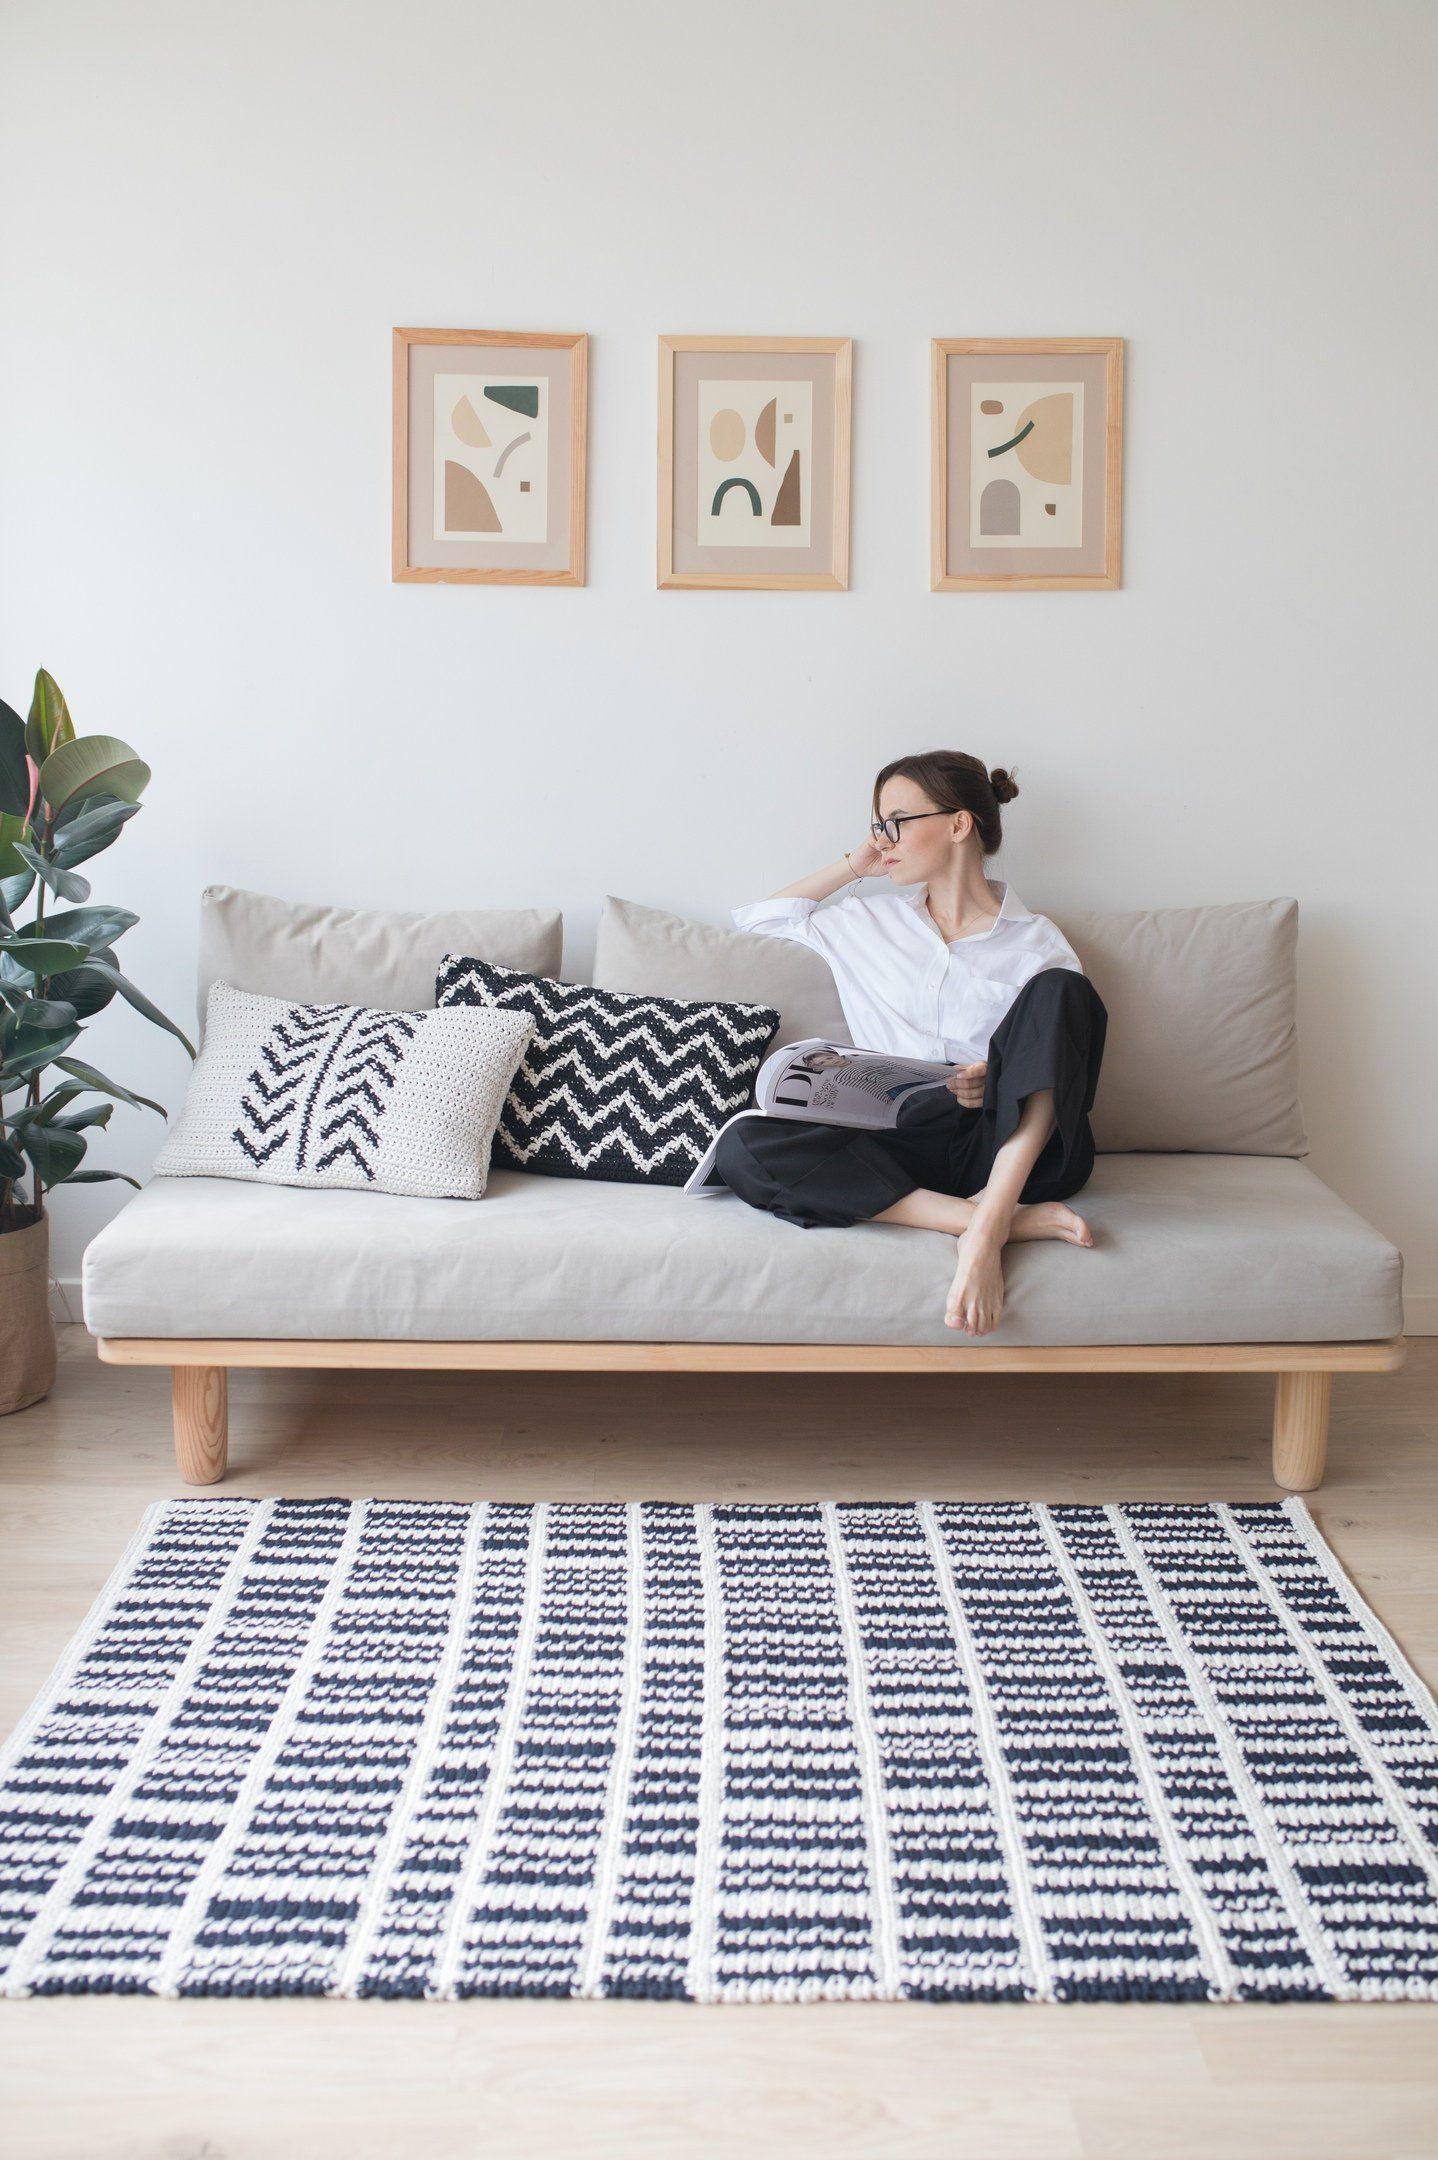 Domino Rug Crochet Pattern Black And White Crochet Rug Modern Rug In Scandinavian Style Wooden Sofa Designs Minimalist Furniture Design Home Decor Furniture